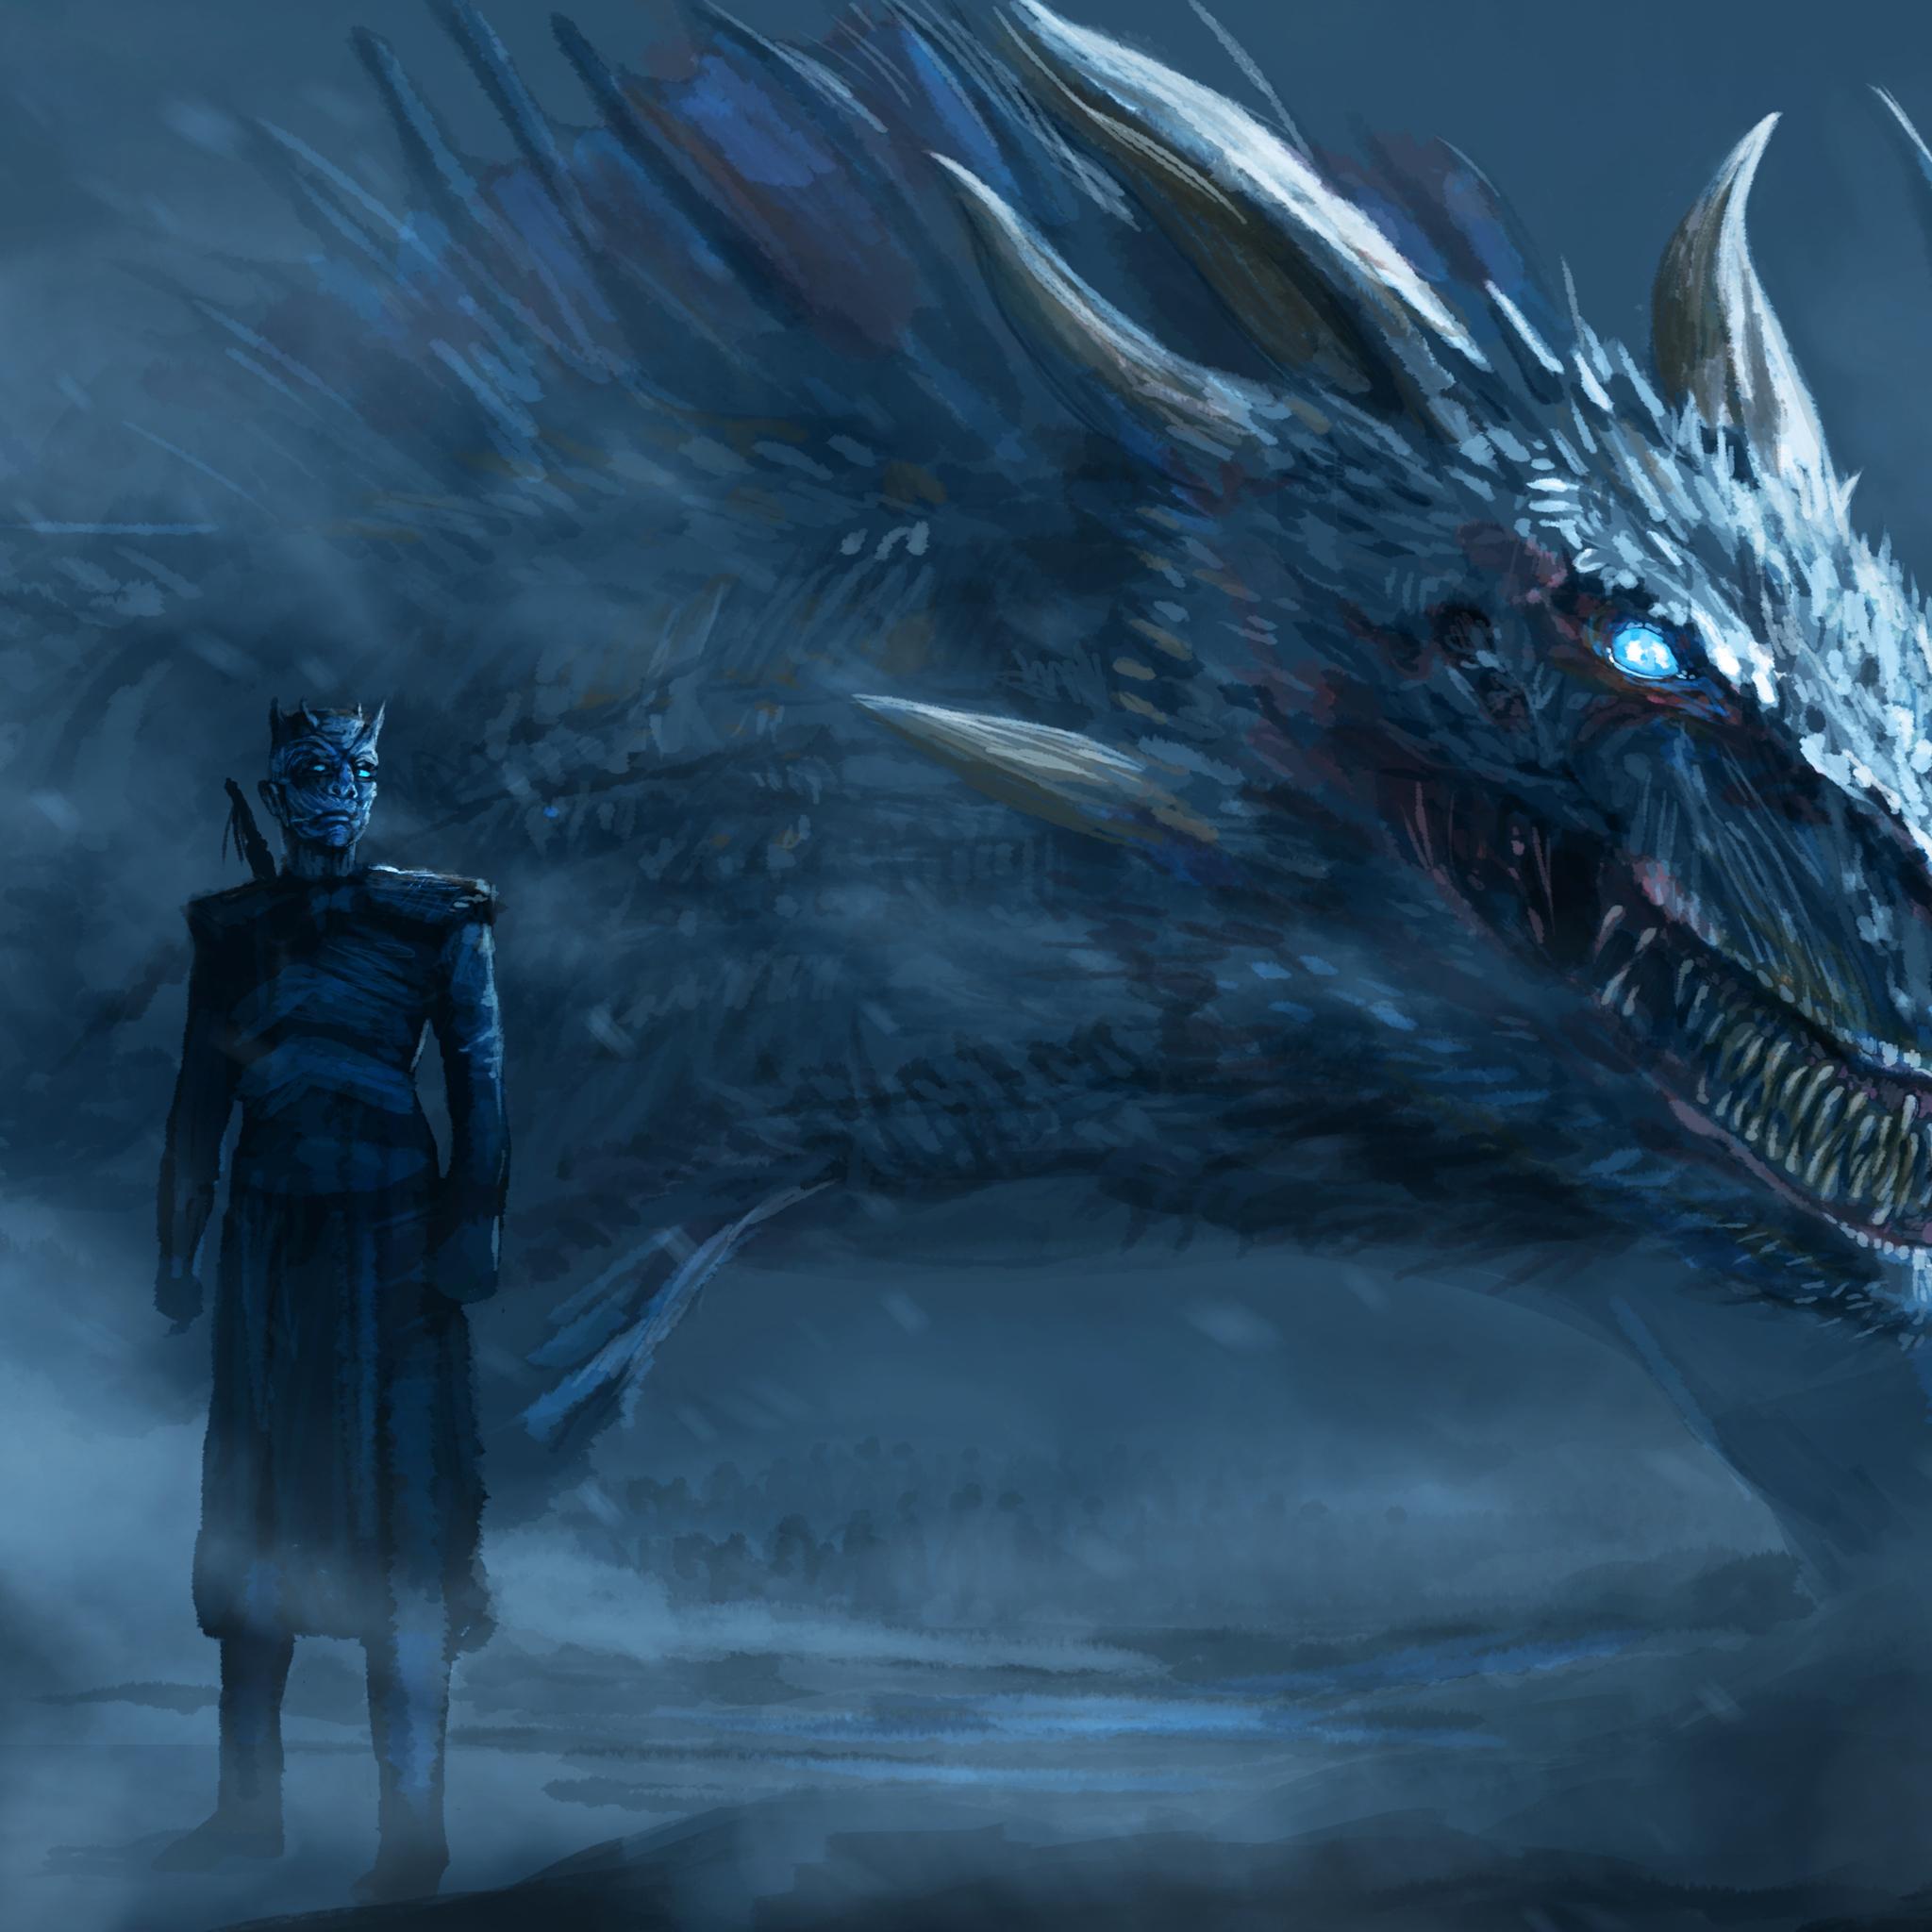 2048x2048 Night King Blue Eyes White Dragon Ipad Air Hd 4k